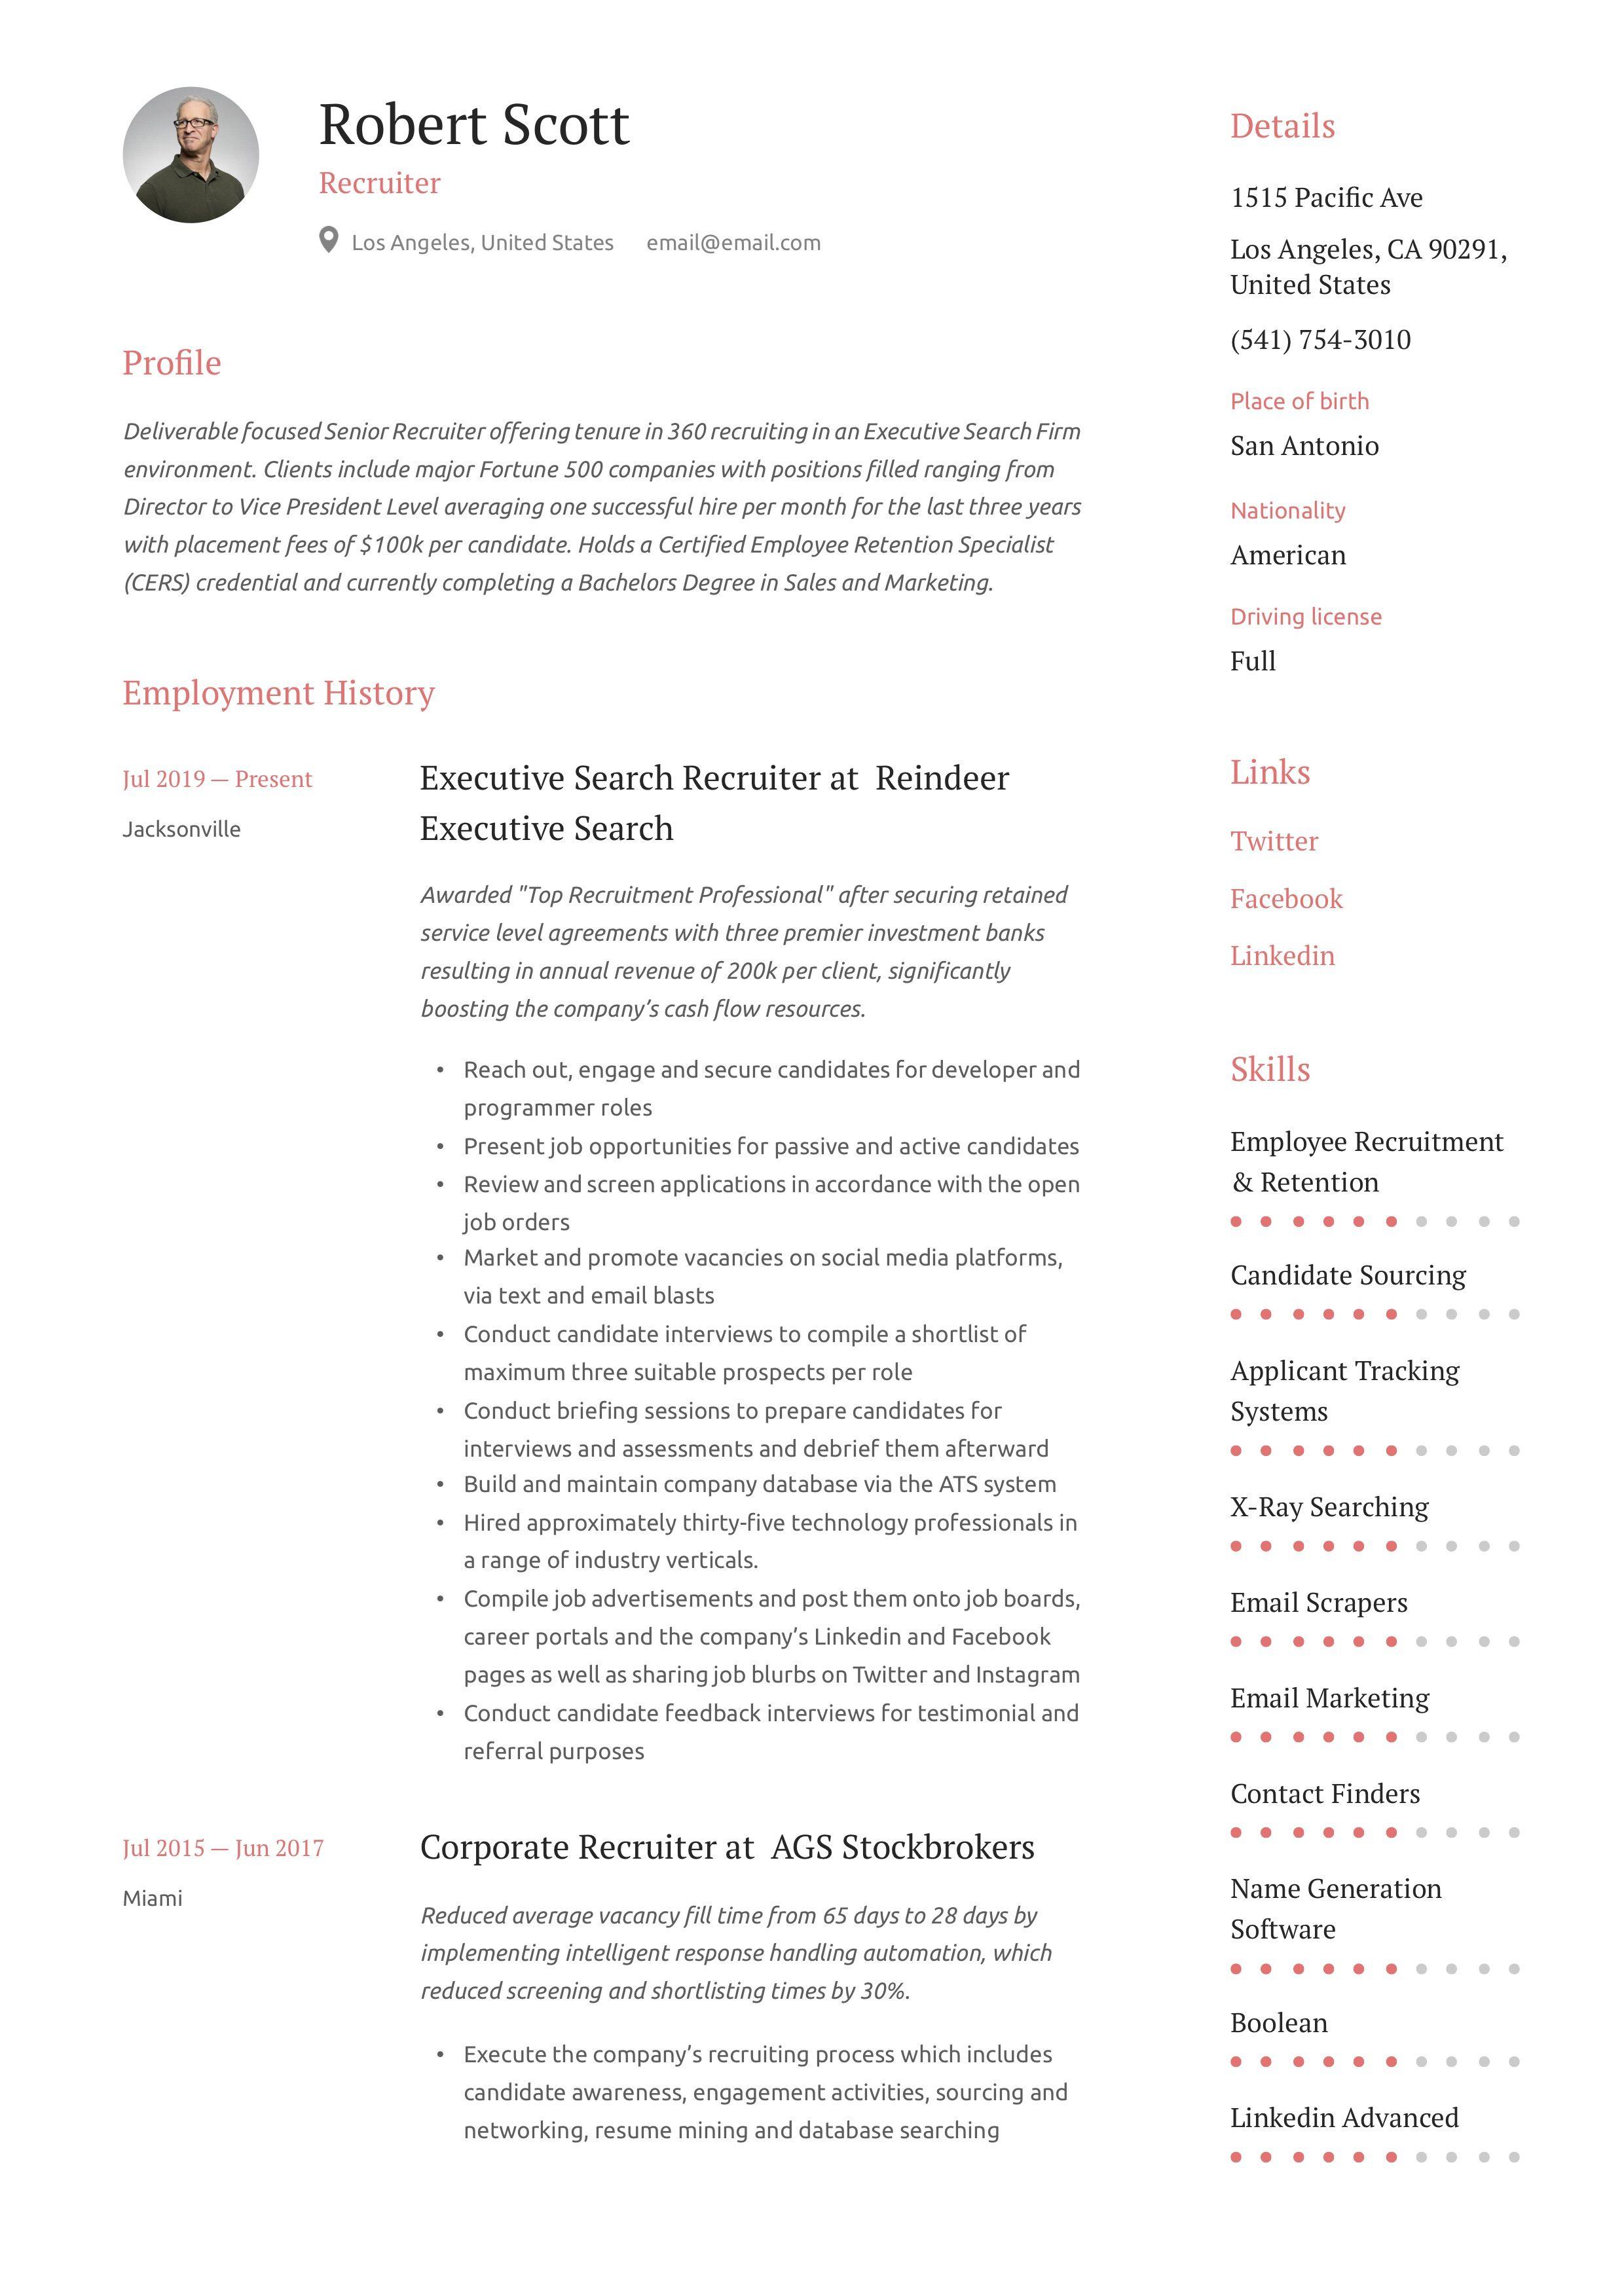 Recruiter Resume Writing Guide In 2020 Resume Recruiter